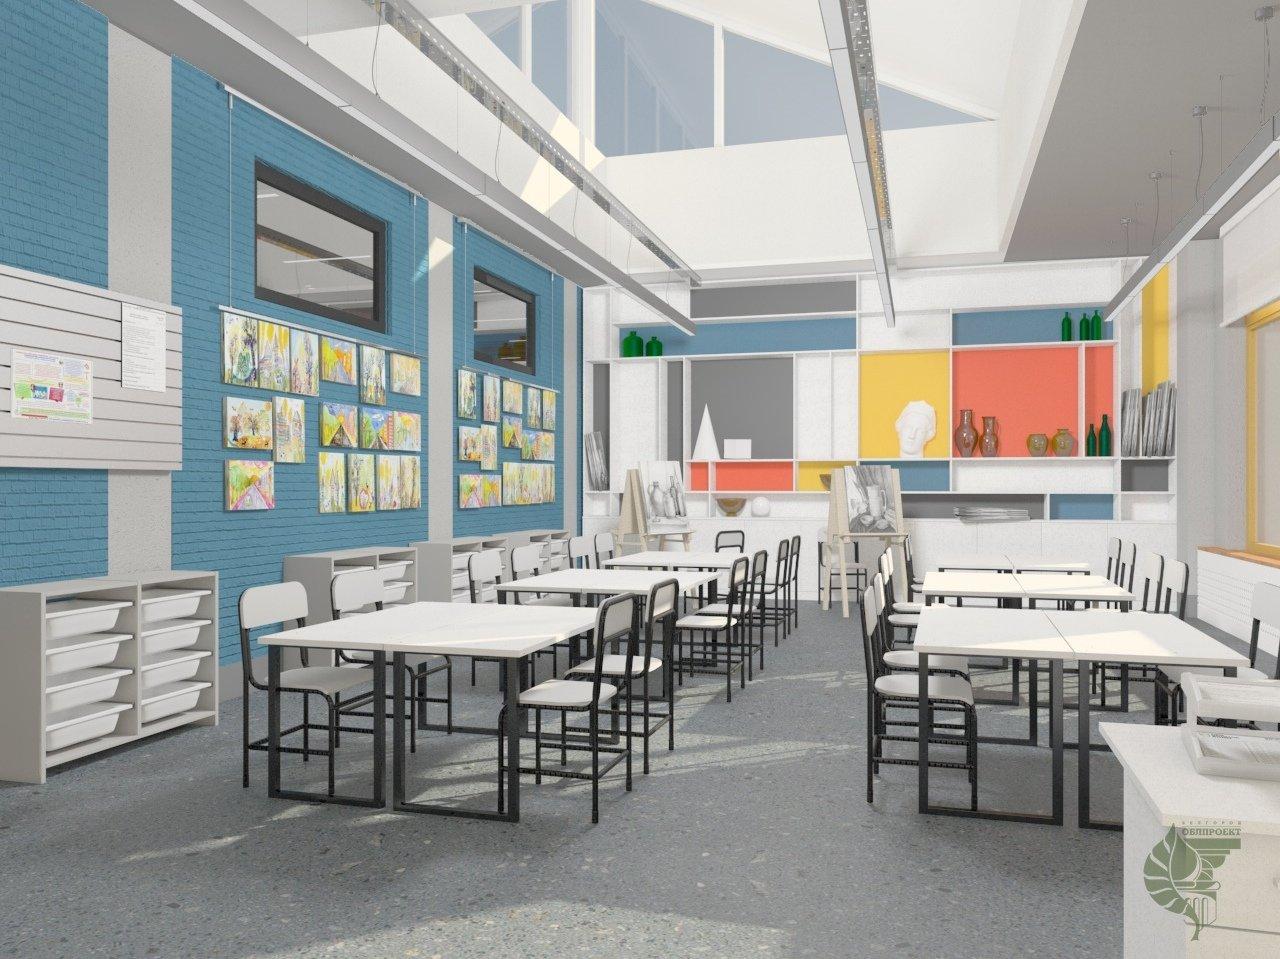 В Белгородском районе построят ещё одну школу, фото-2